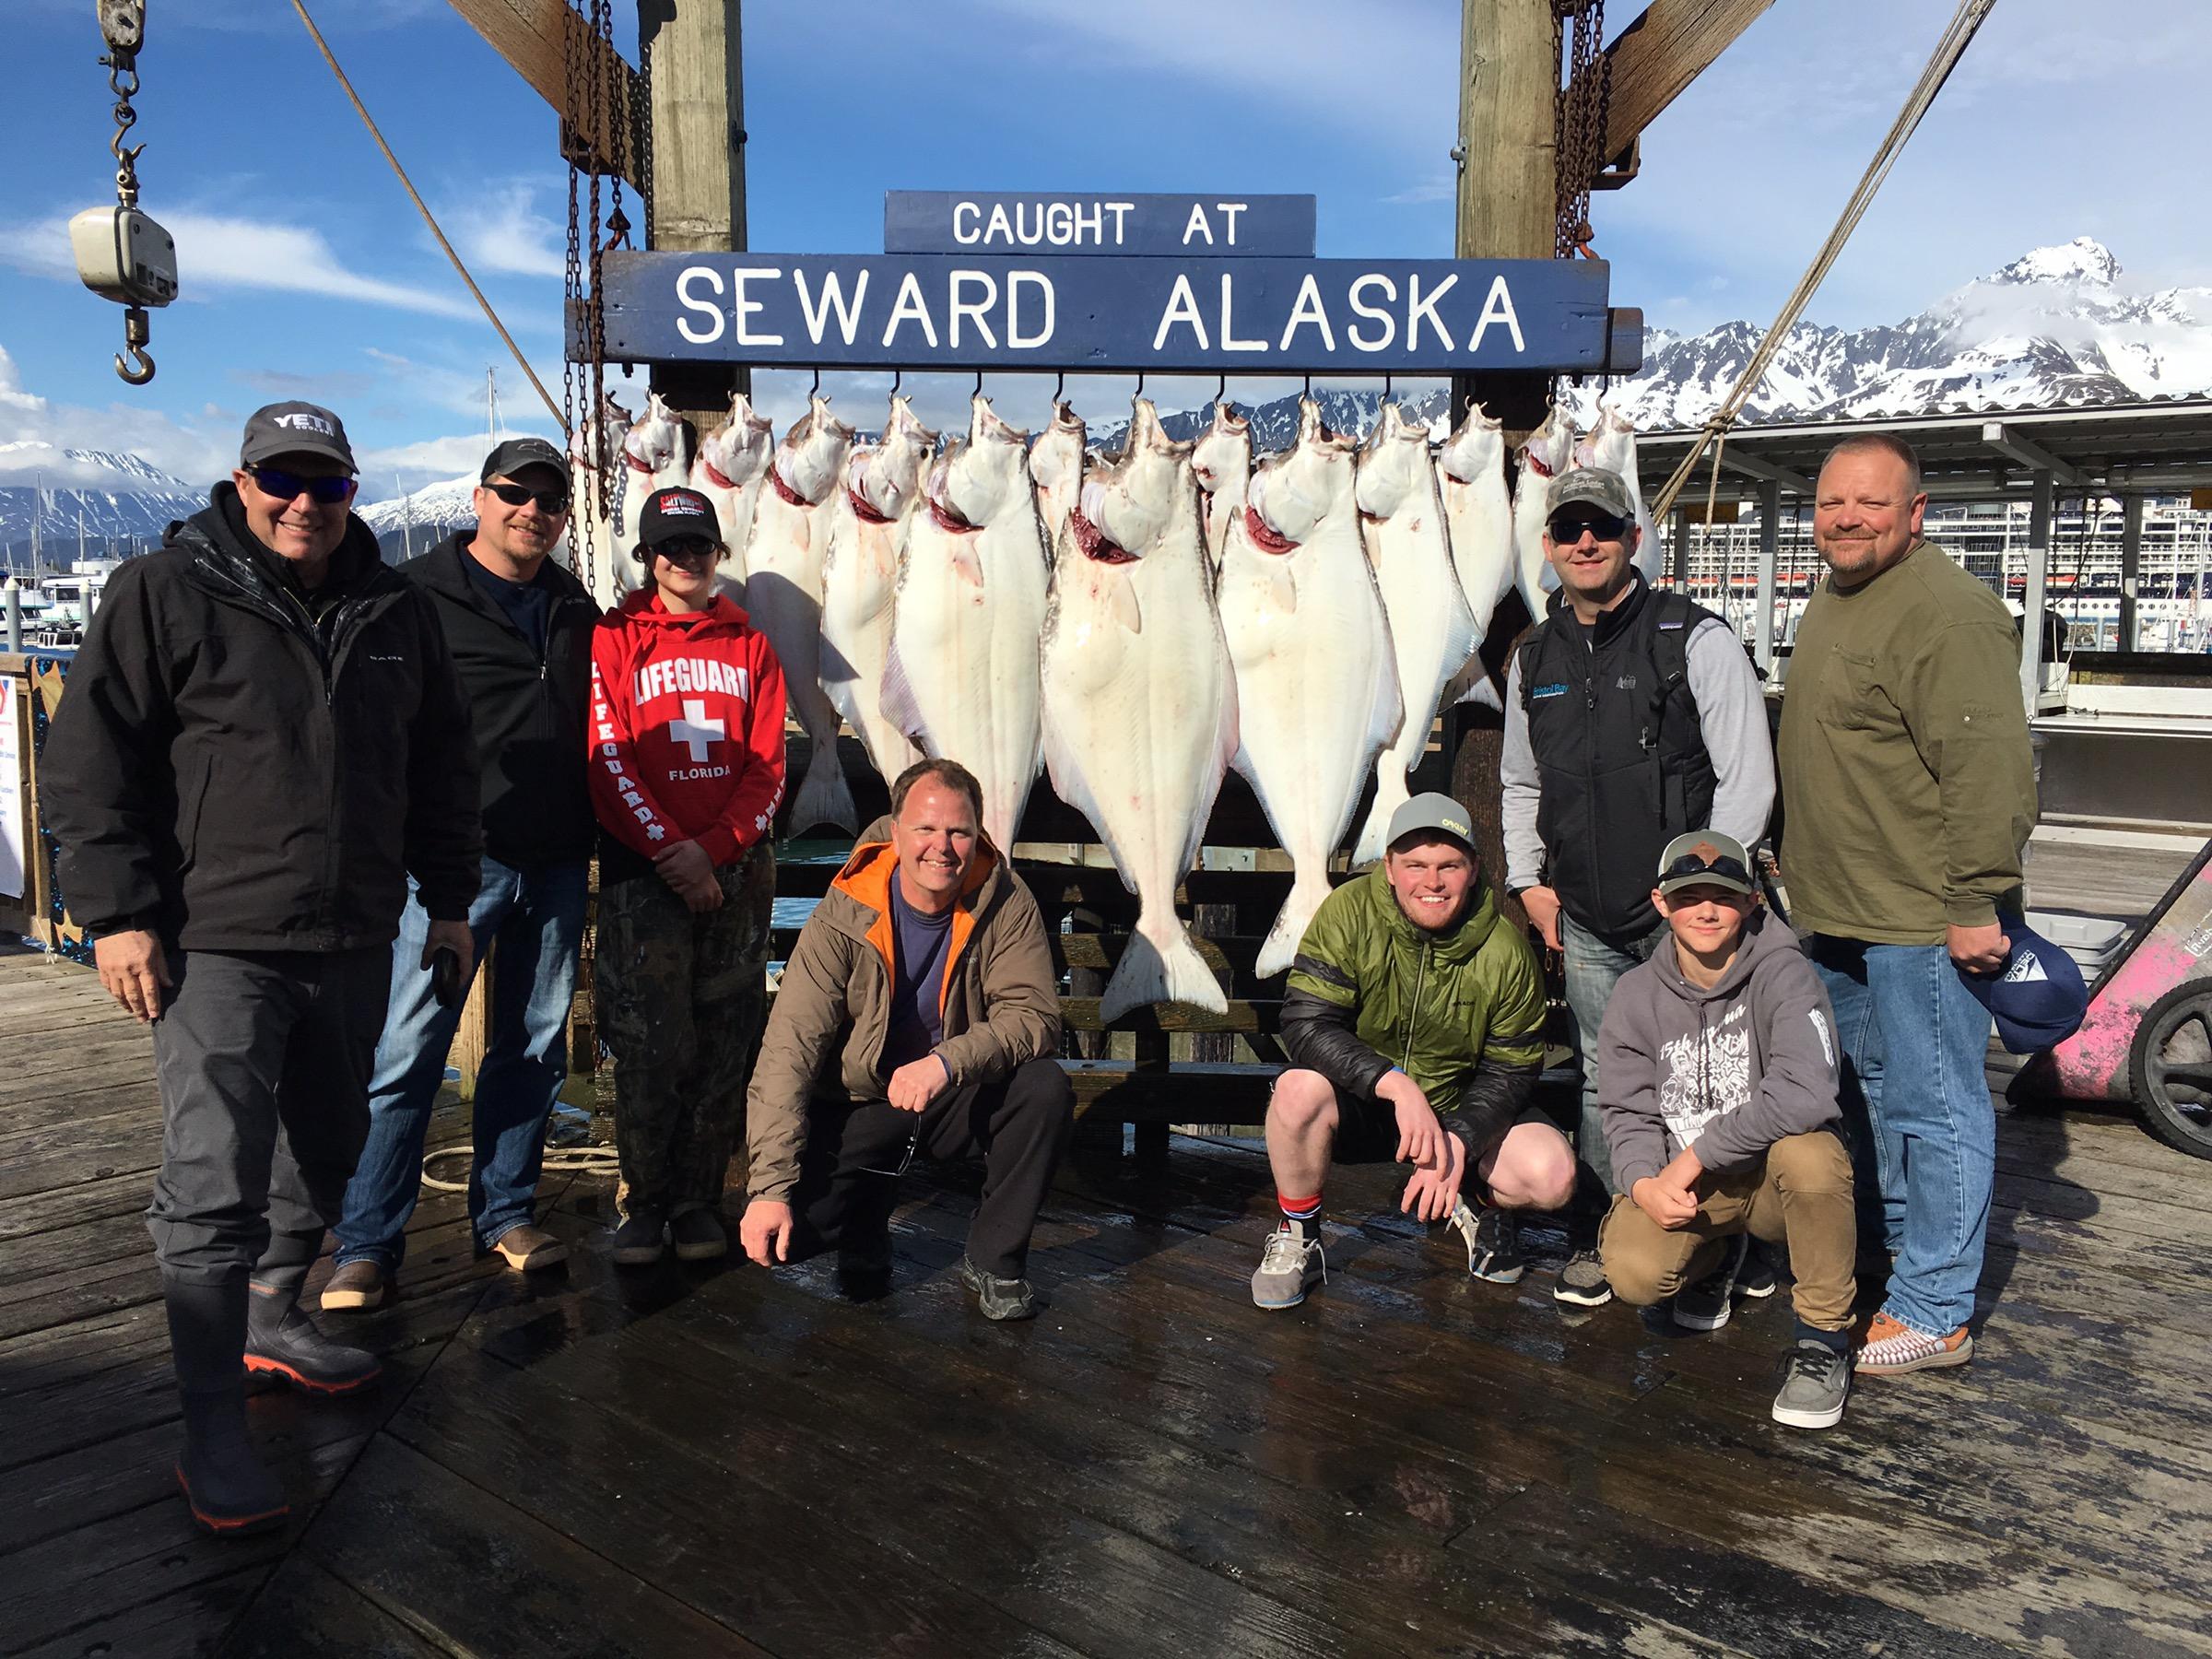 June 2 halibut fishing profish n sea for Seward halibut fishing